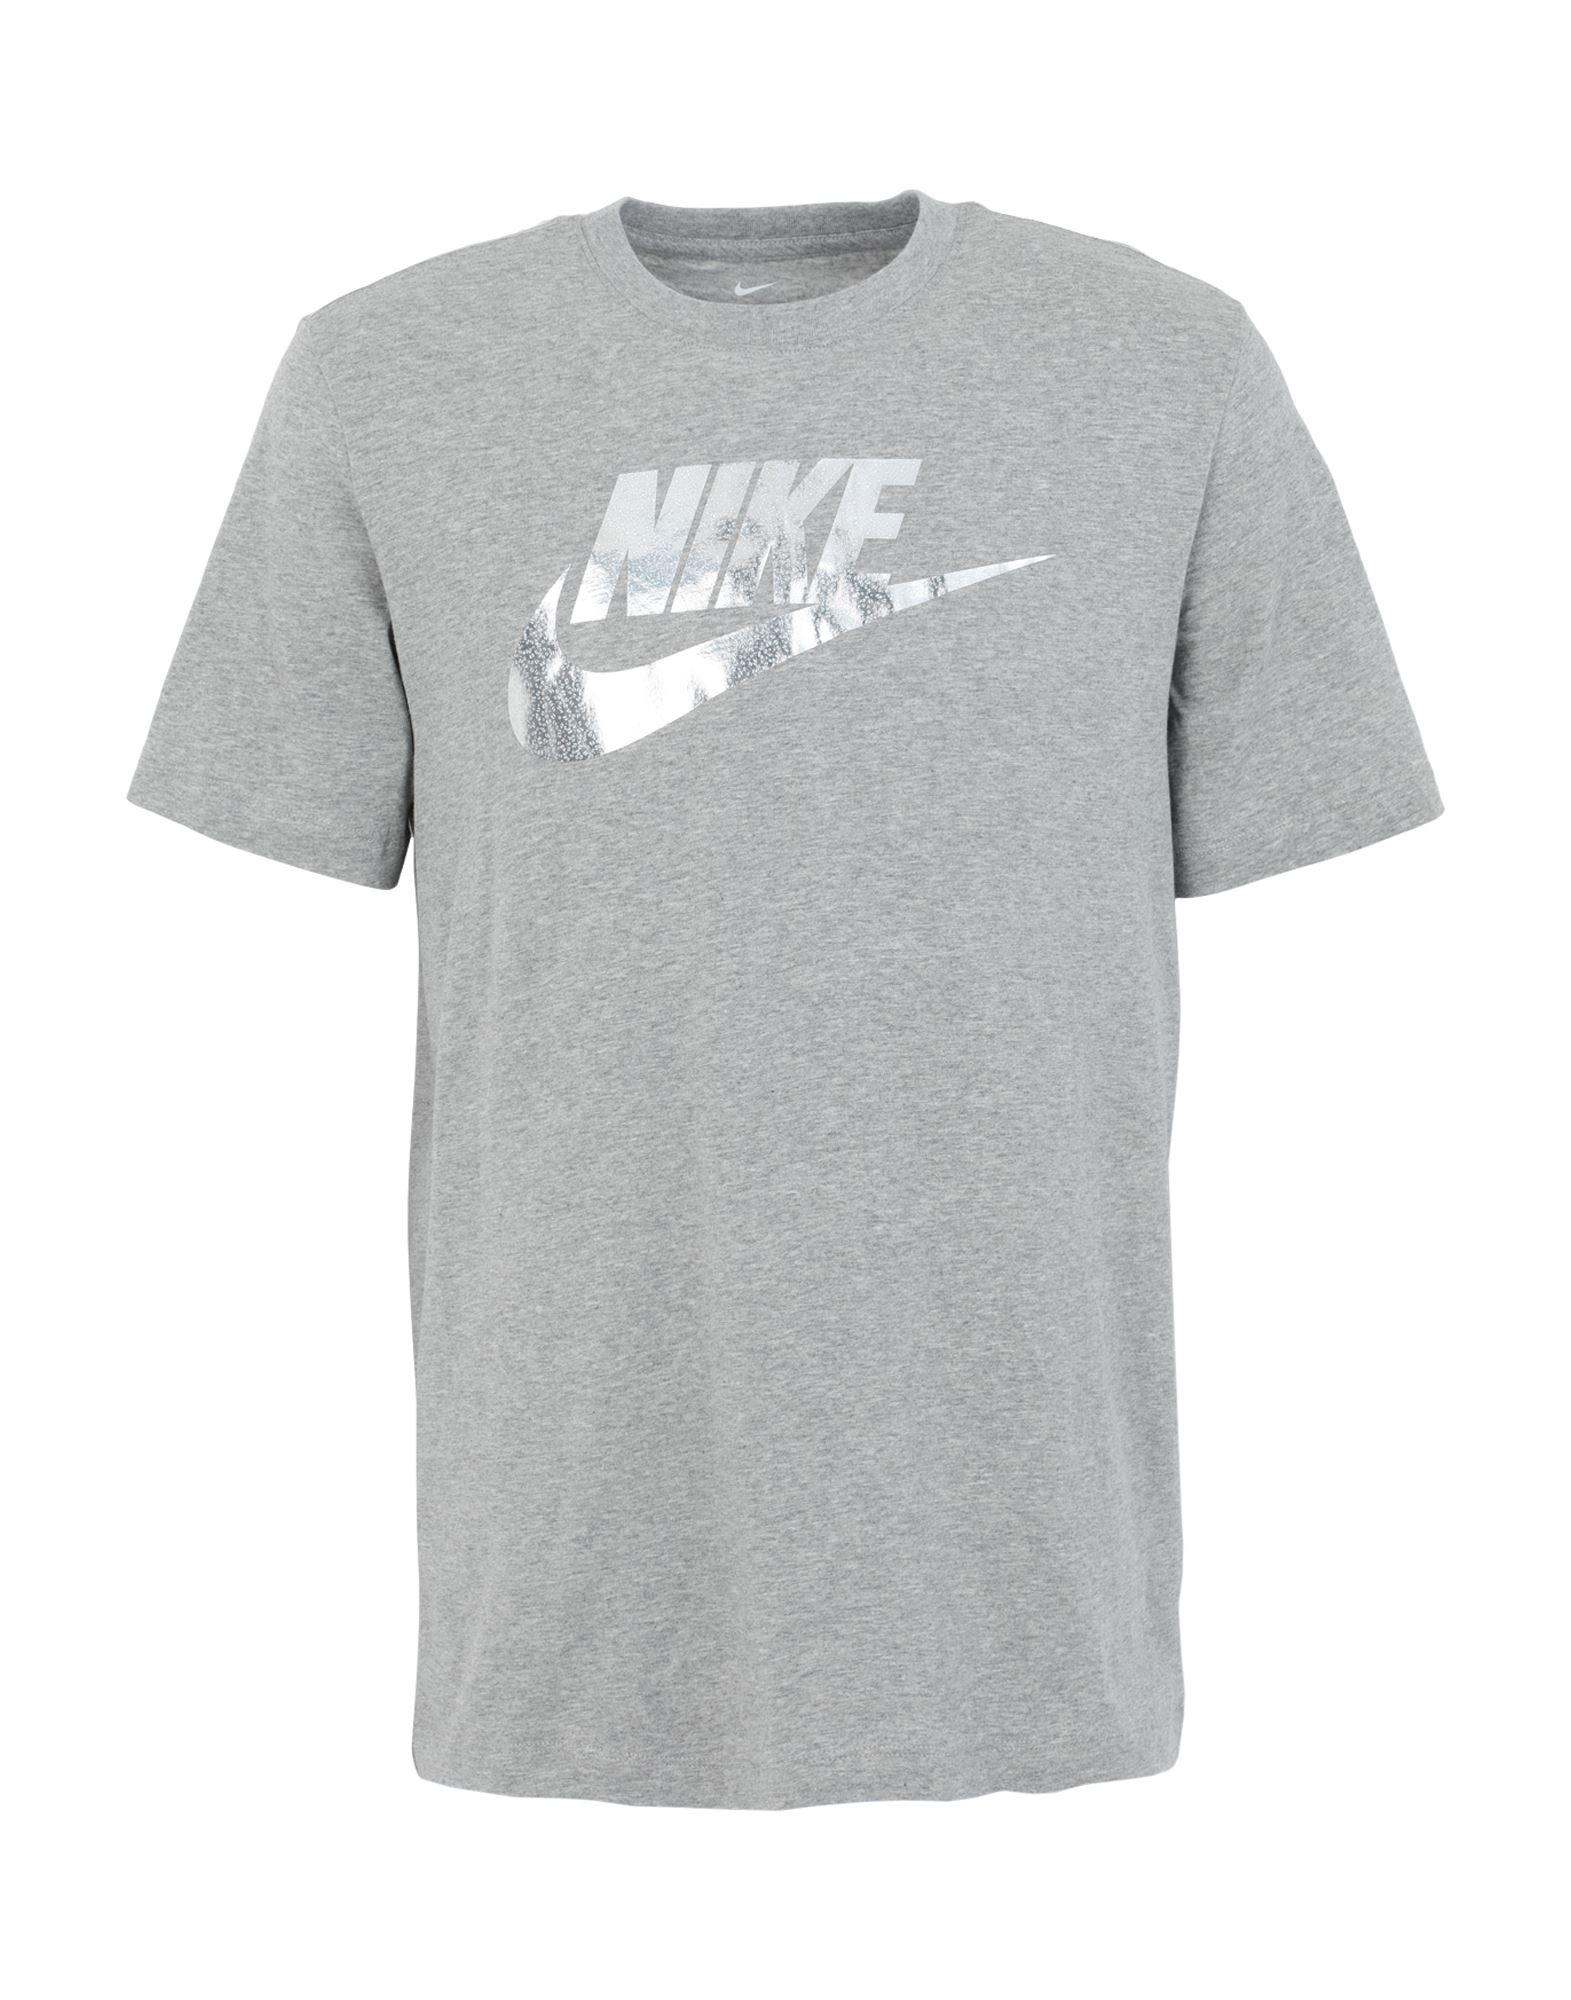 NIKE Футболка футболка тренировочная женская nike academy 893741 361